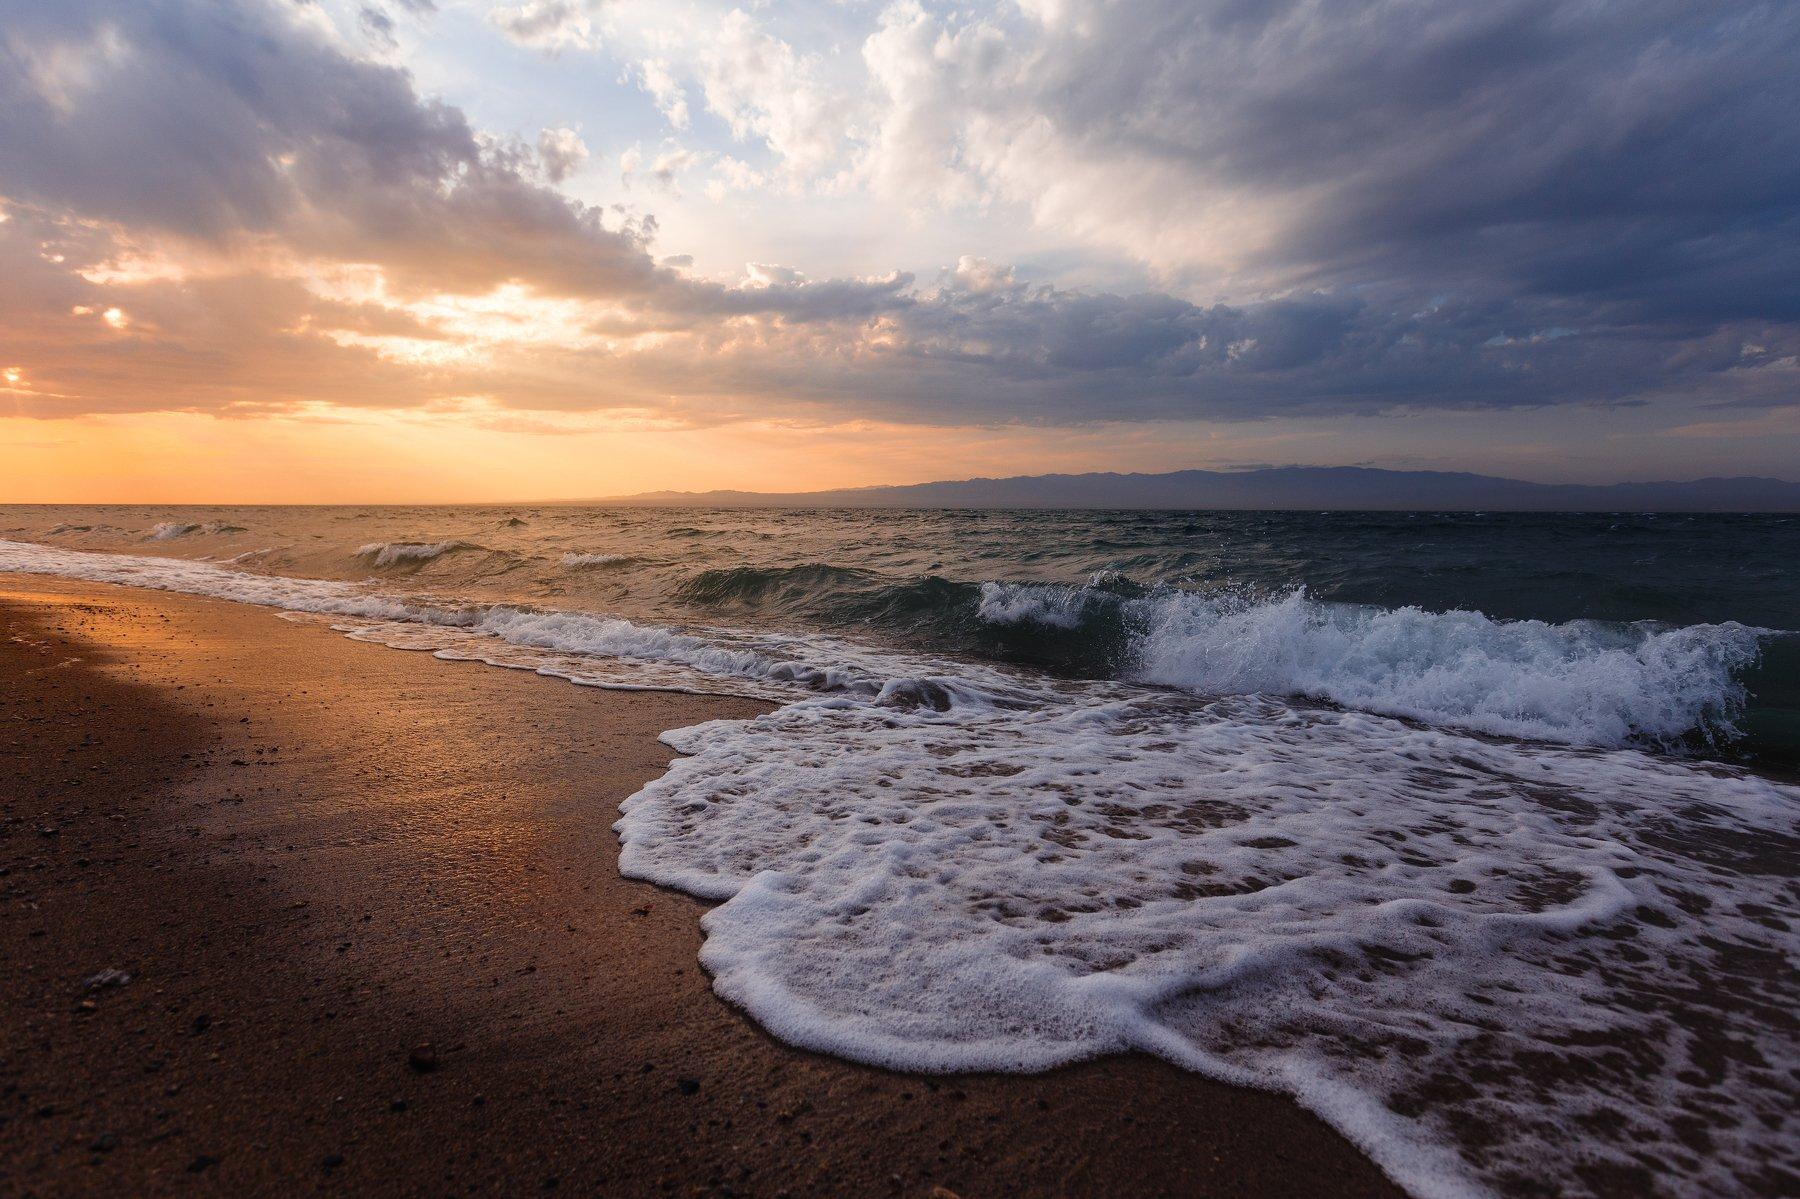 природа, пейзаж, закат, озеро, море, монголия, Попов Станислав